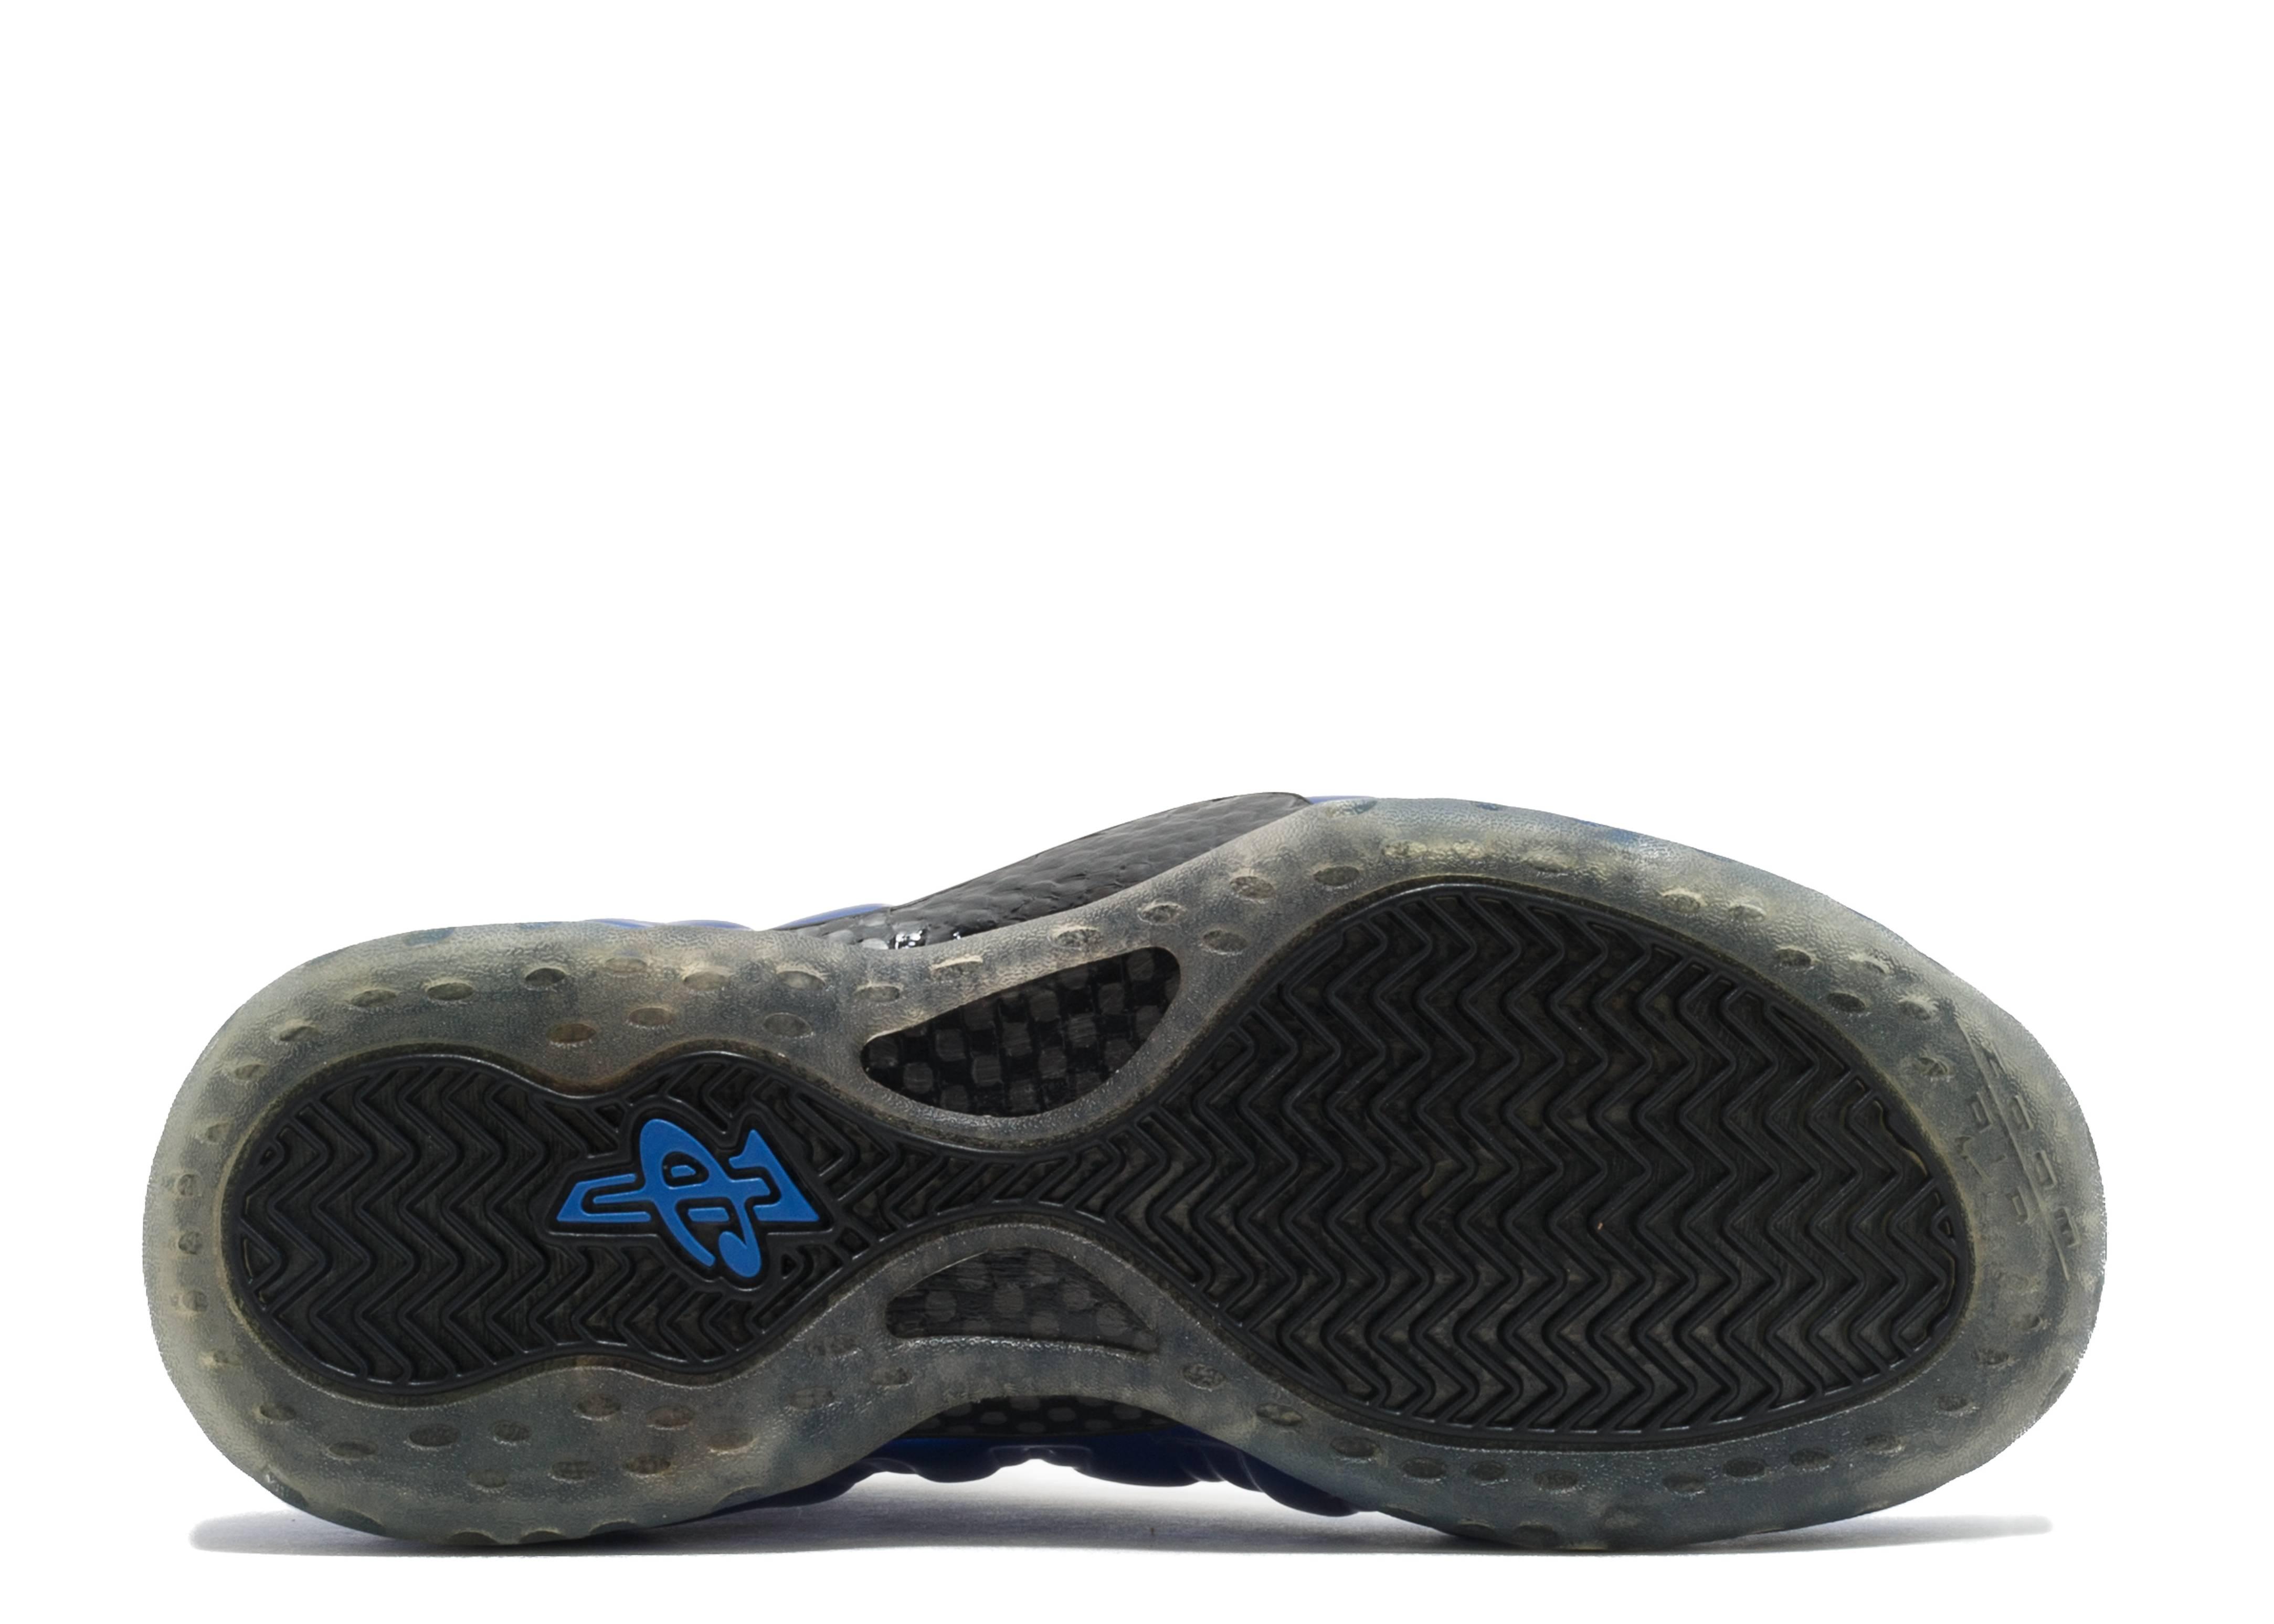 Air Foamposite One - Nike - 314996 401 - sport royal game royal-wlf gry  f7b6a739e